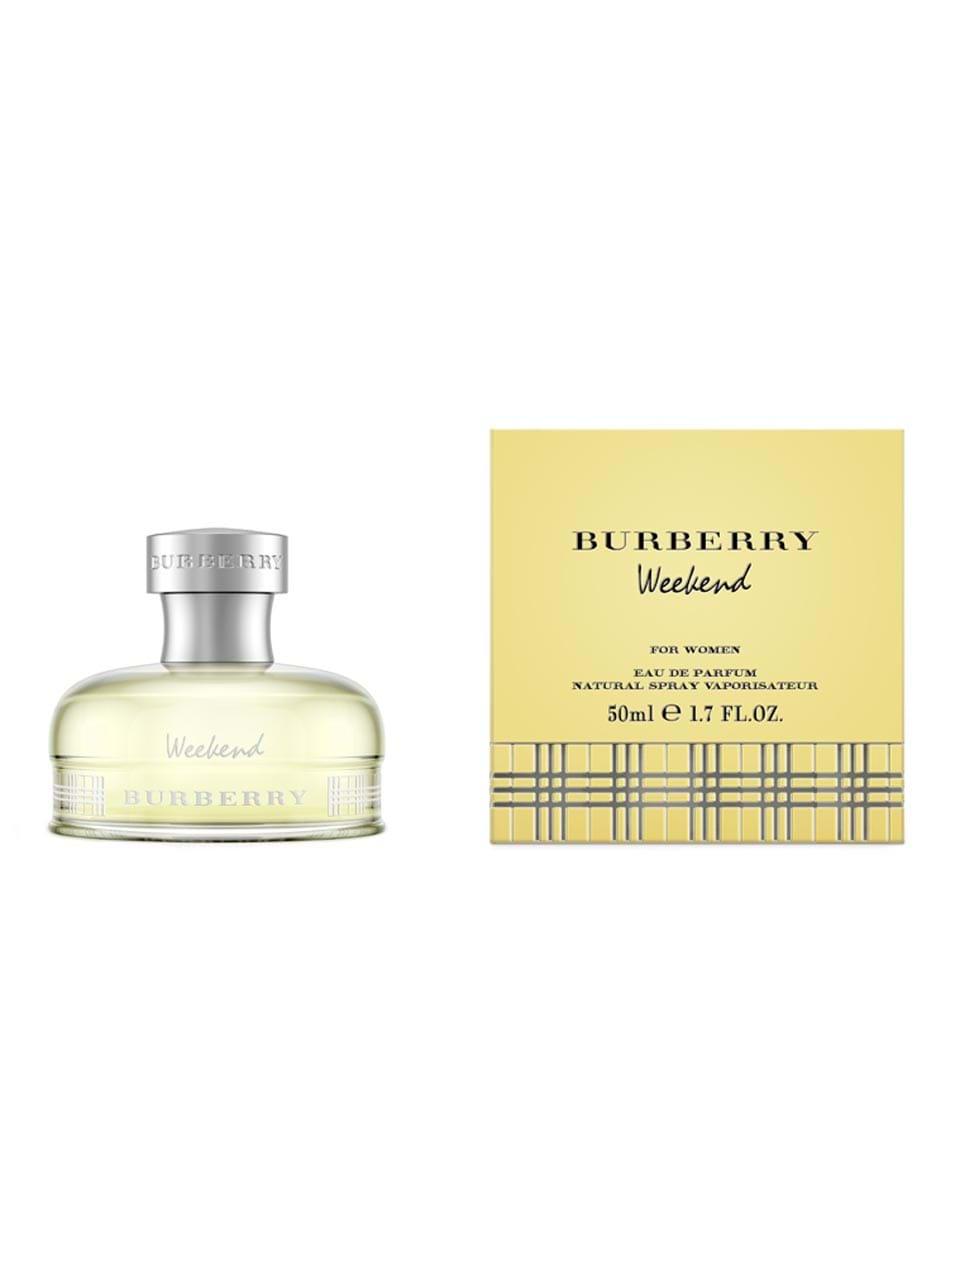 For Parfum Weekend Eau Burberry Women 50 De Ml v8nm0wN